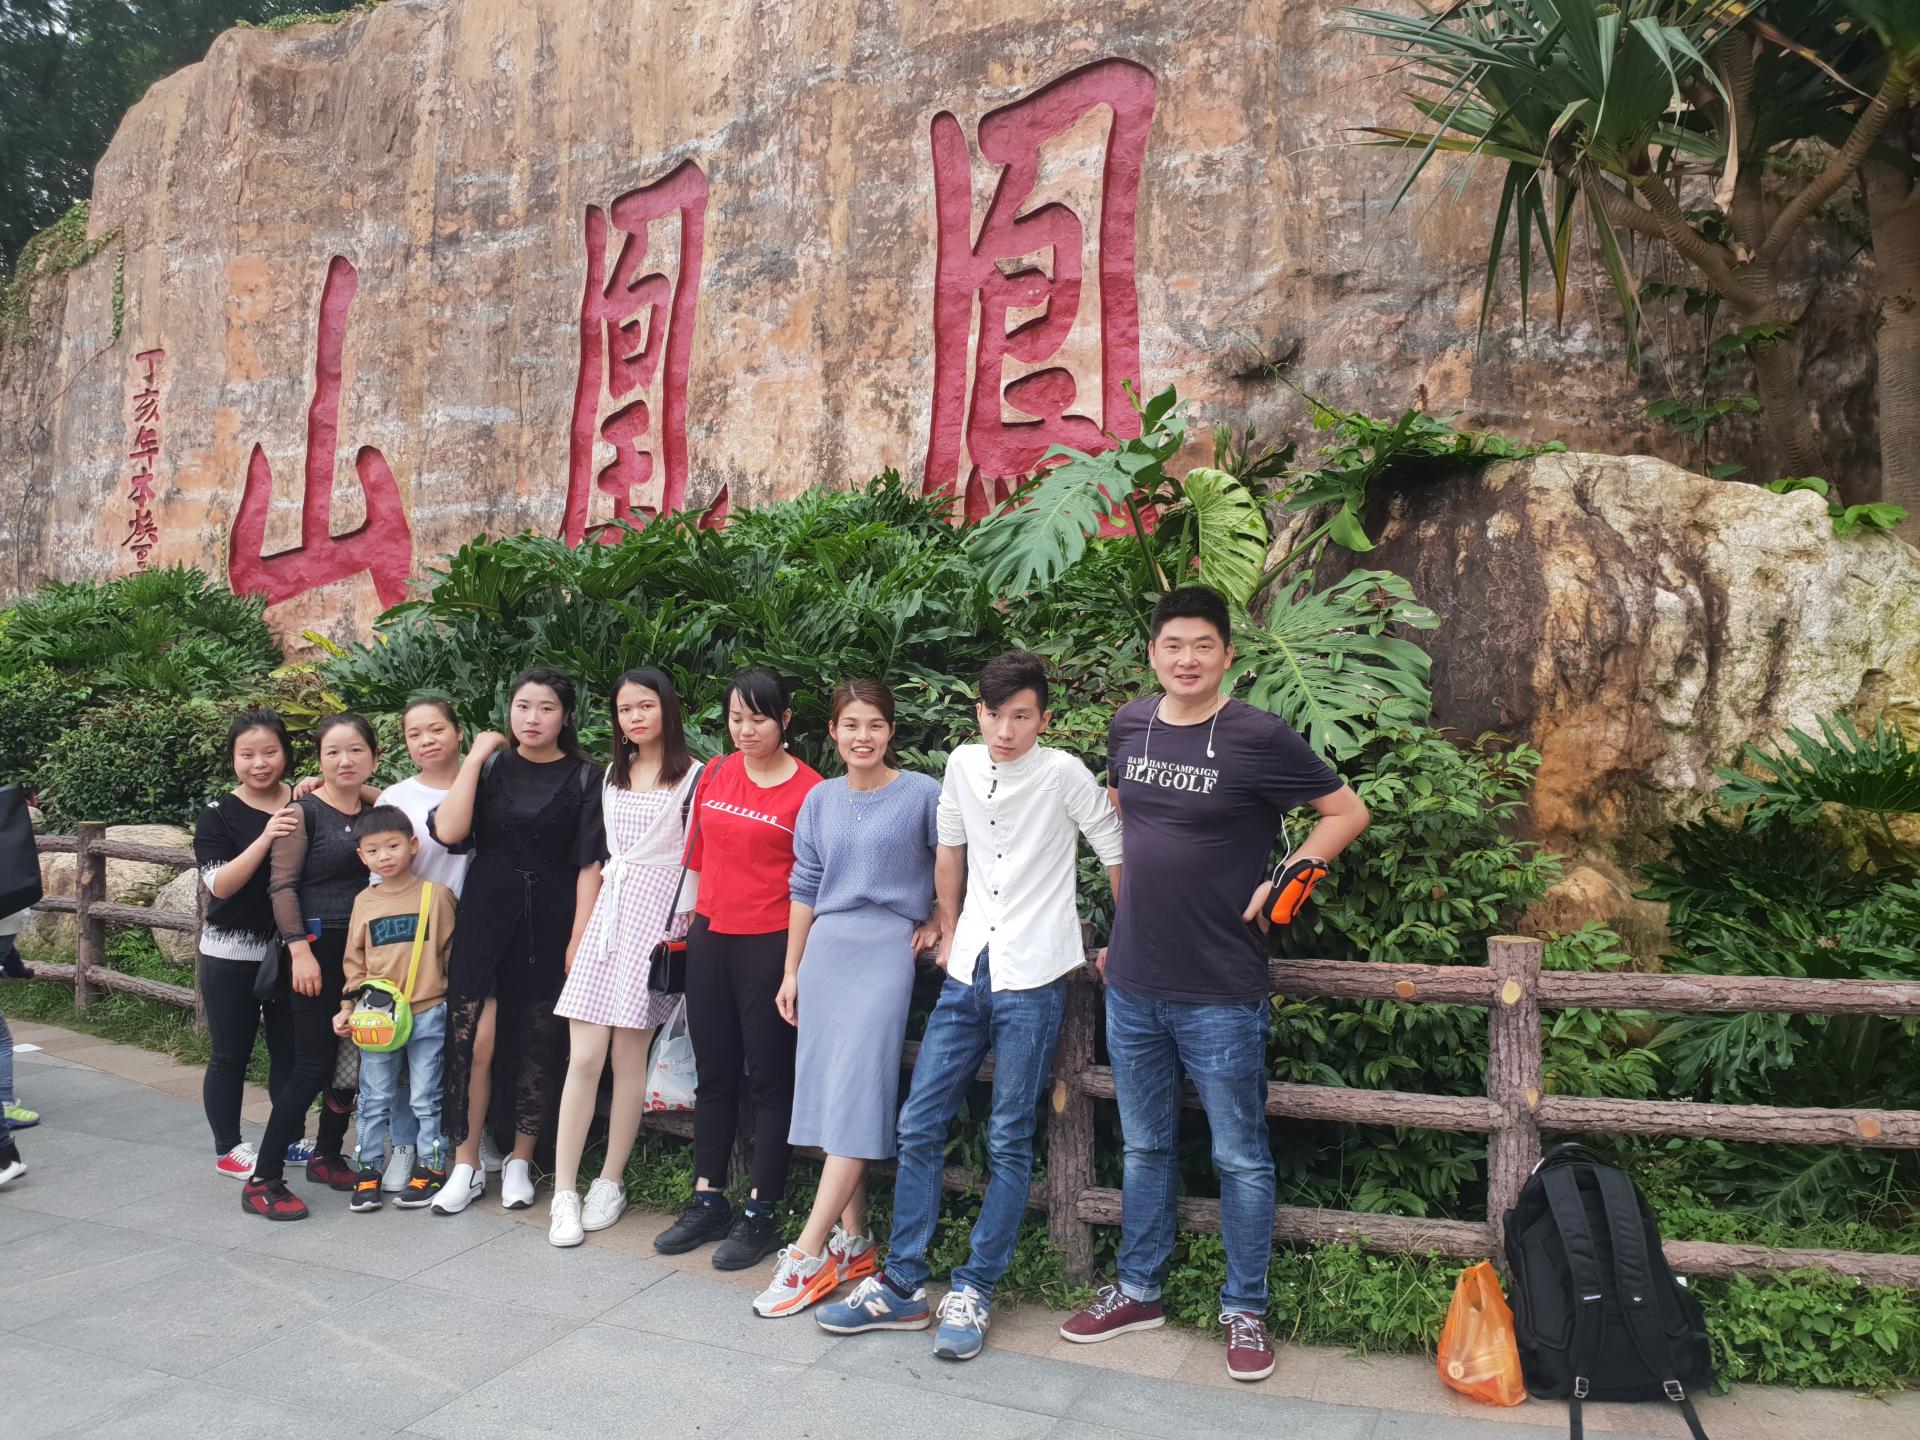 Shenzhen YIPI Eelectronic Limited Mountain Camping